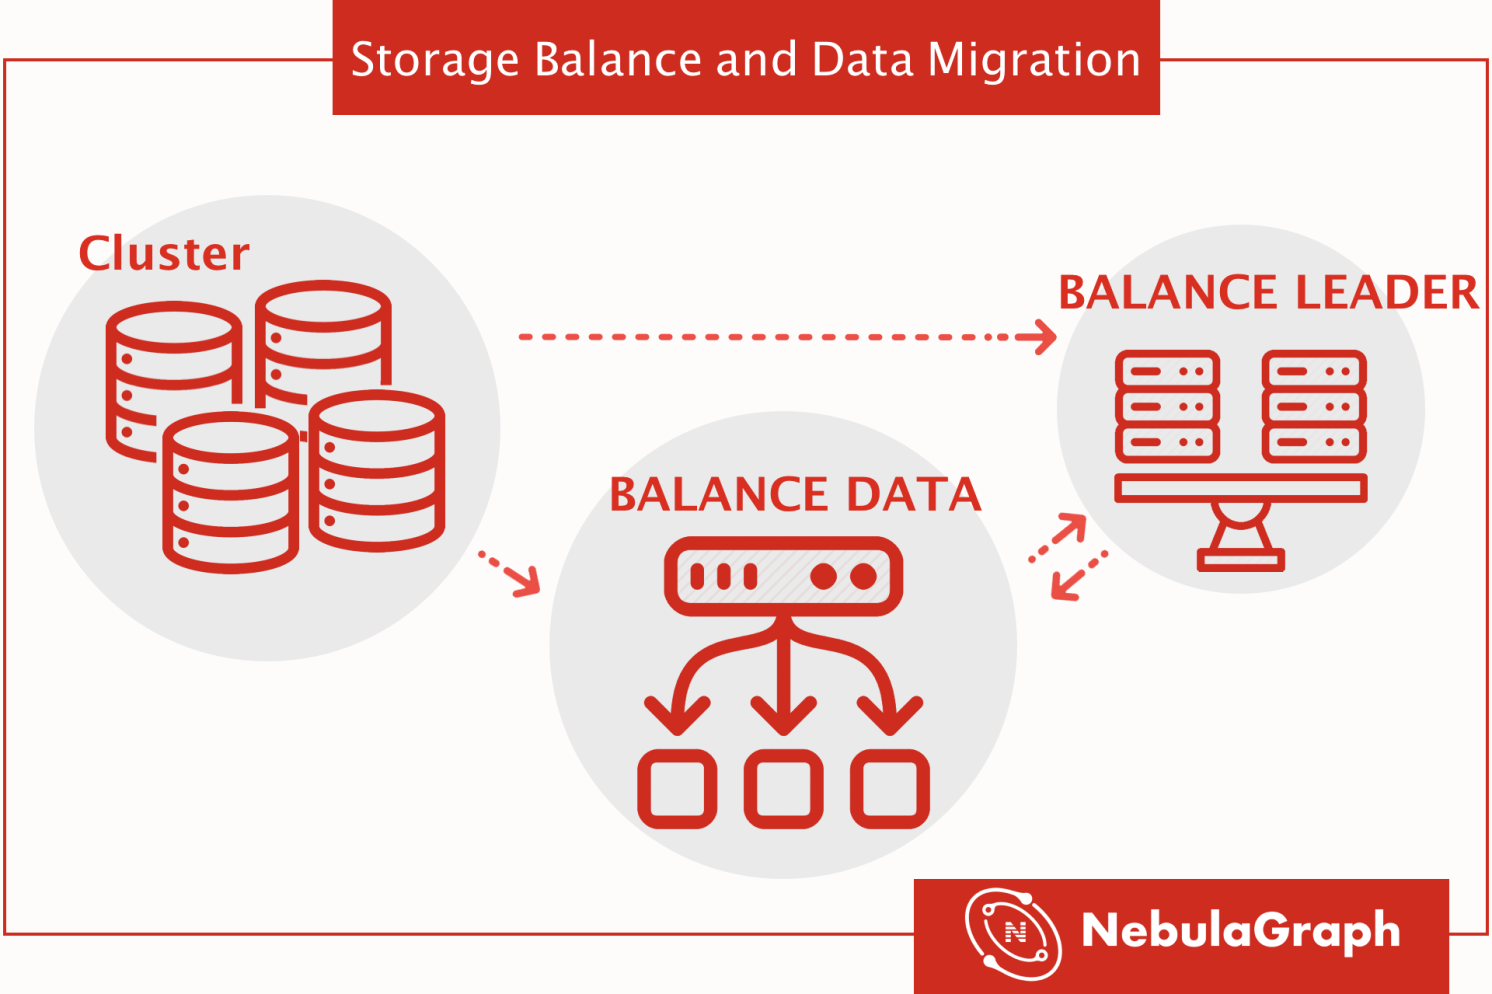 Storage Balance and Data Migration